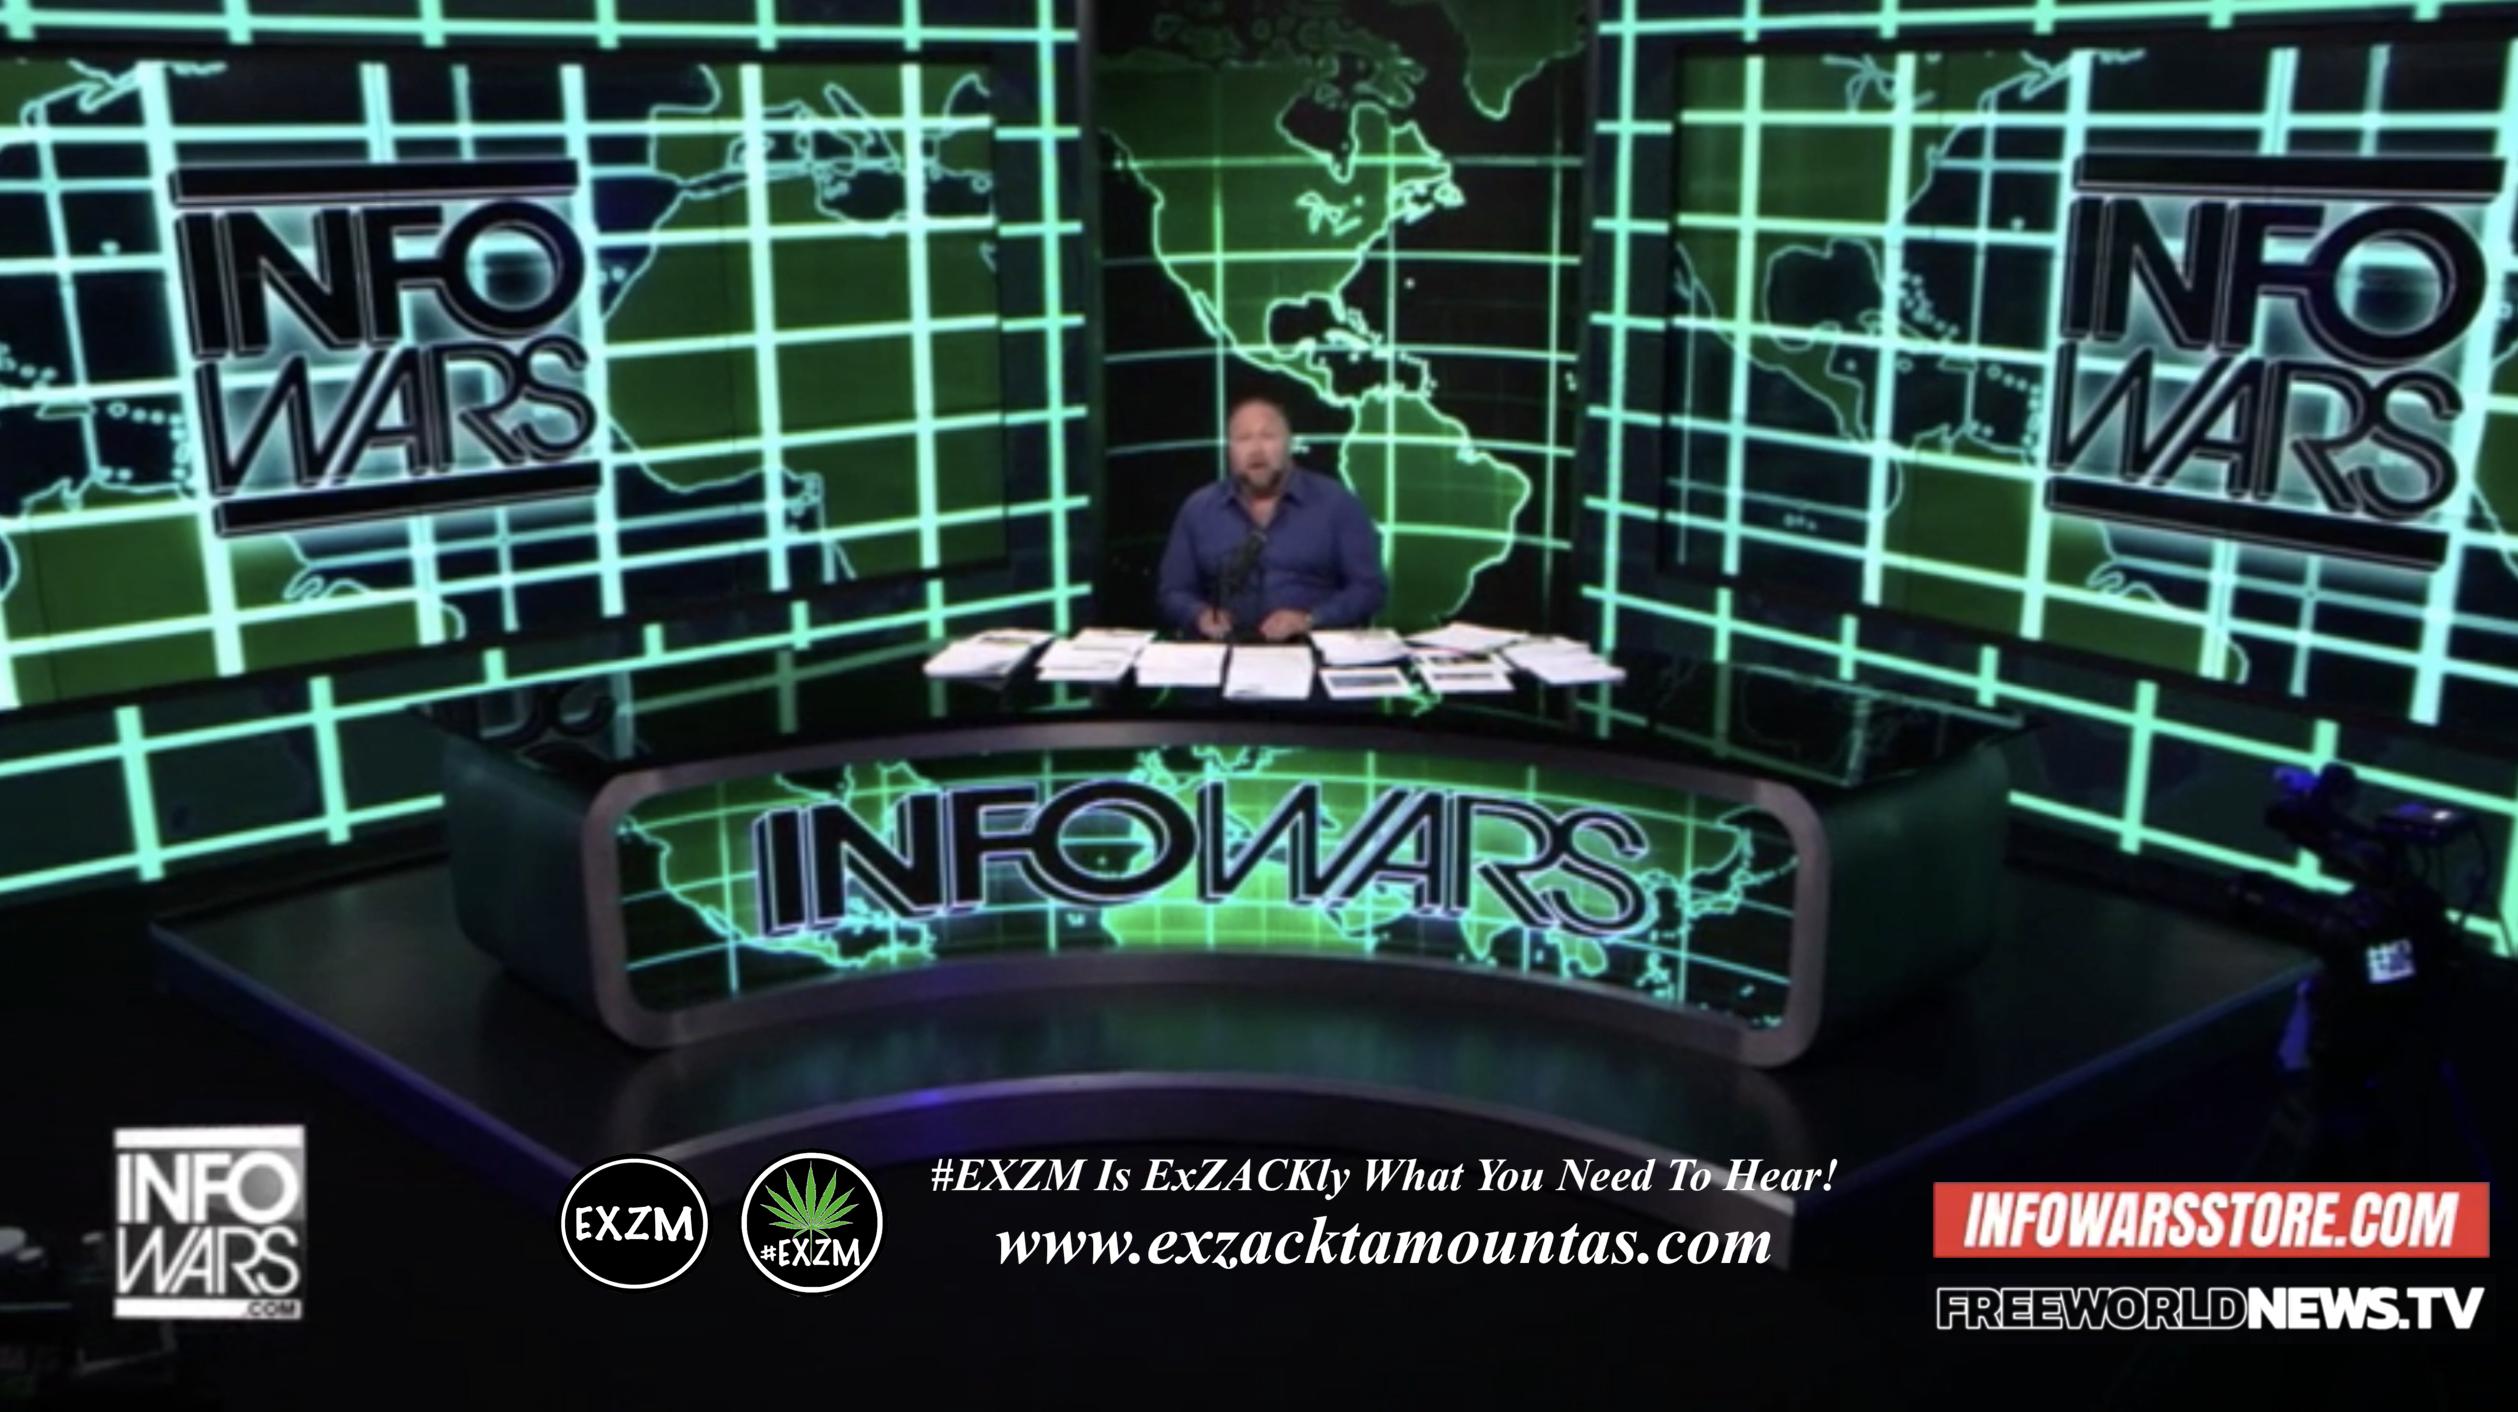 Alex Jones Live In Infowars Studio Free World News TV EXZM Zack Mount September 5th 2021 copy